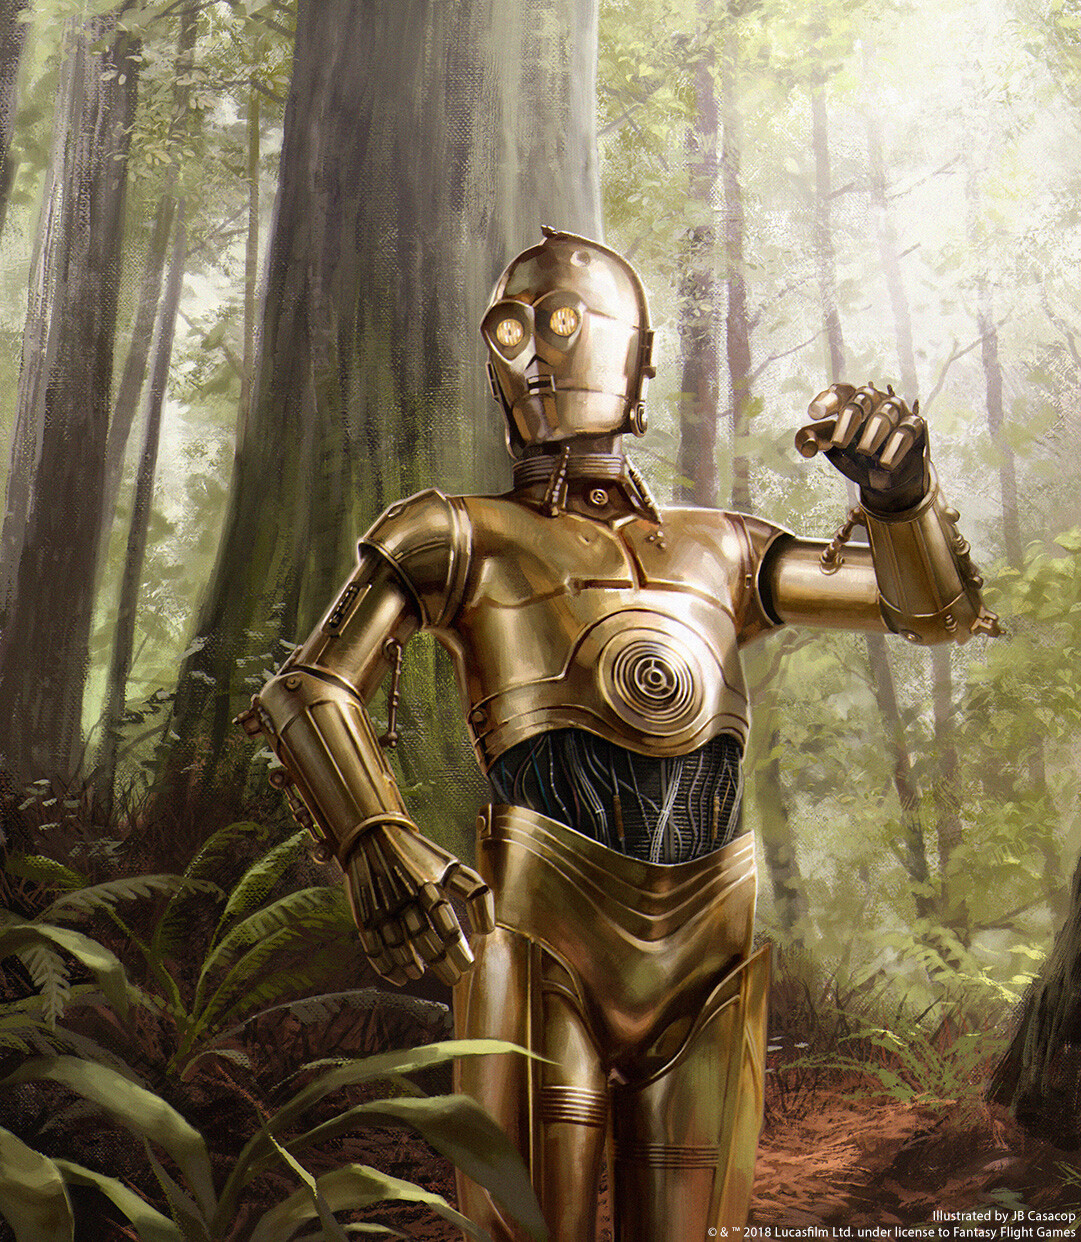 C-3PO: Human Cyborg-Relations